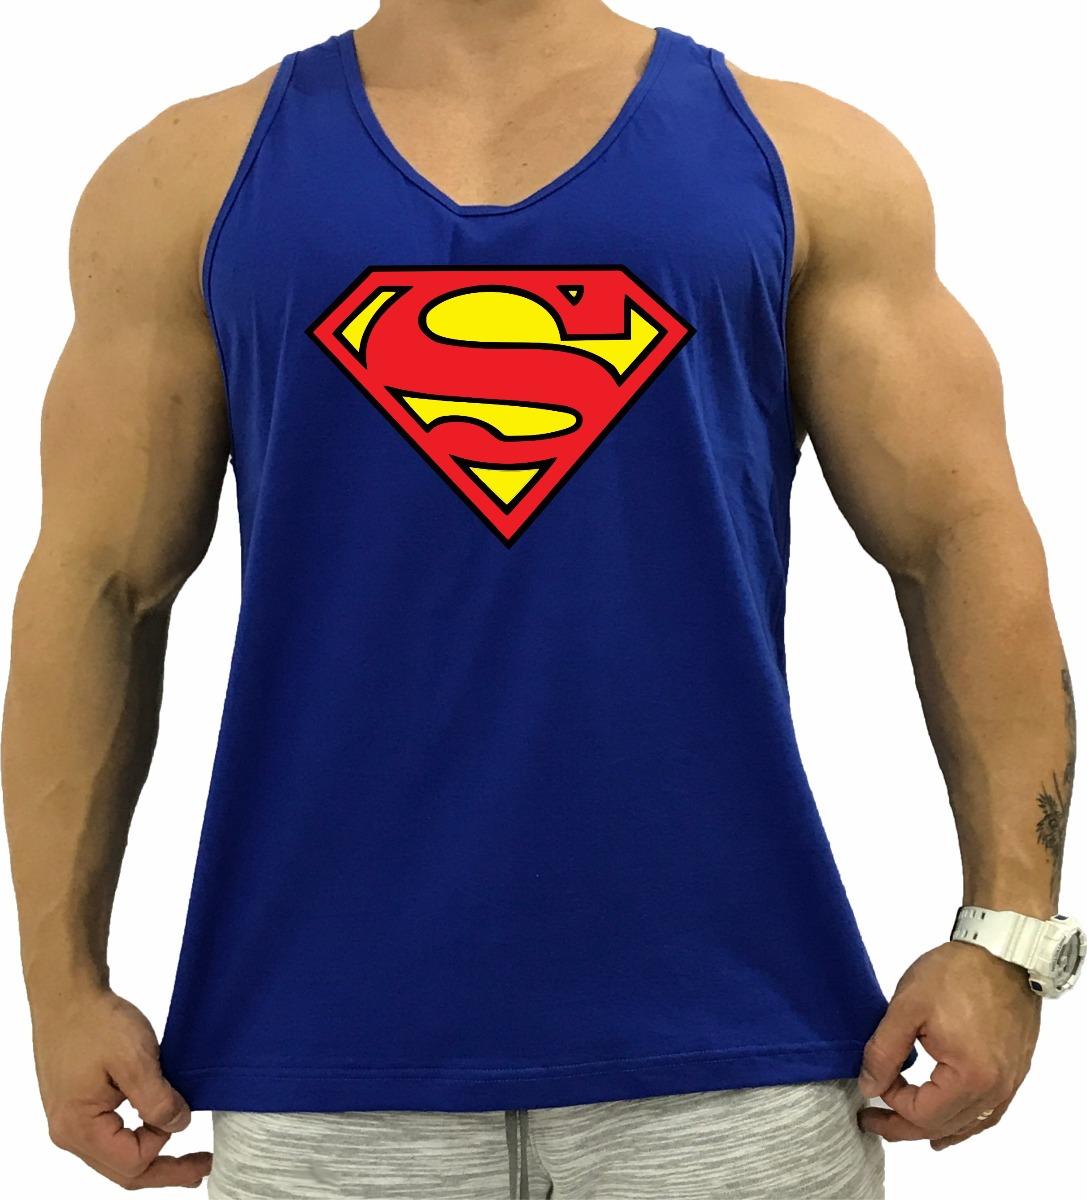 13c42d326 Carregando zoom... regata masculina cavada azul super homem superman heroi